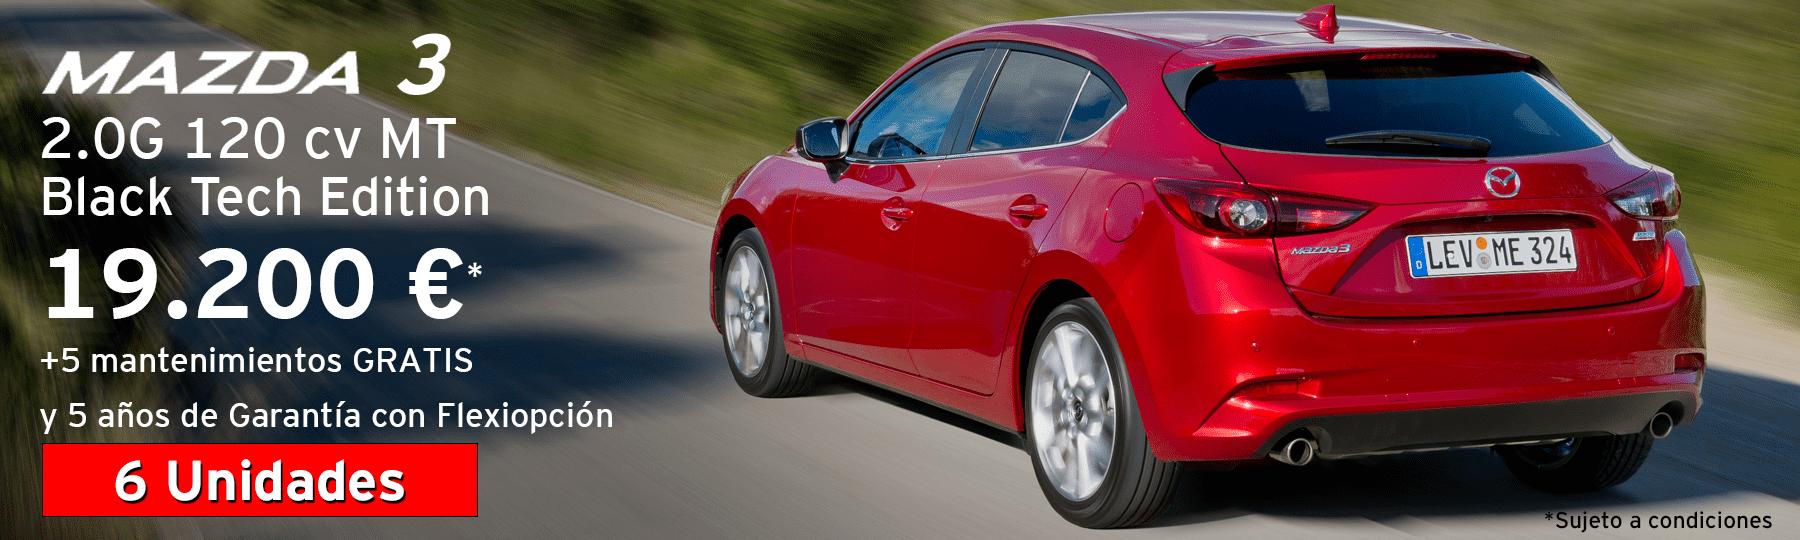 6 Uds. Mazda 3 2.0G 120cv Black Tech Edition